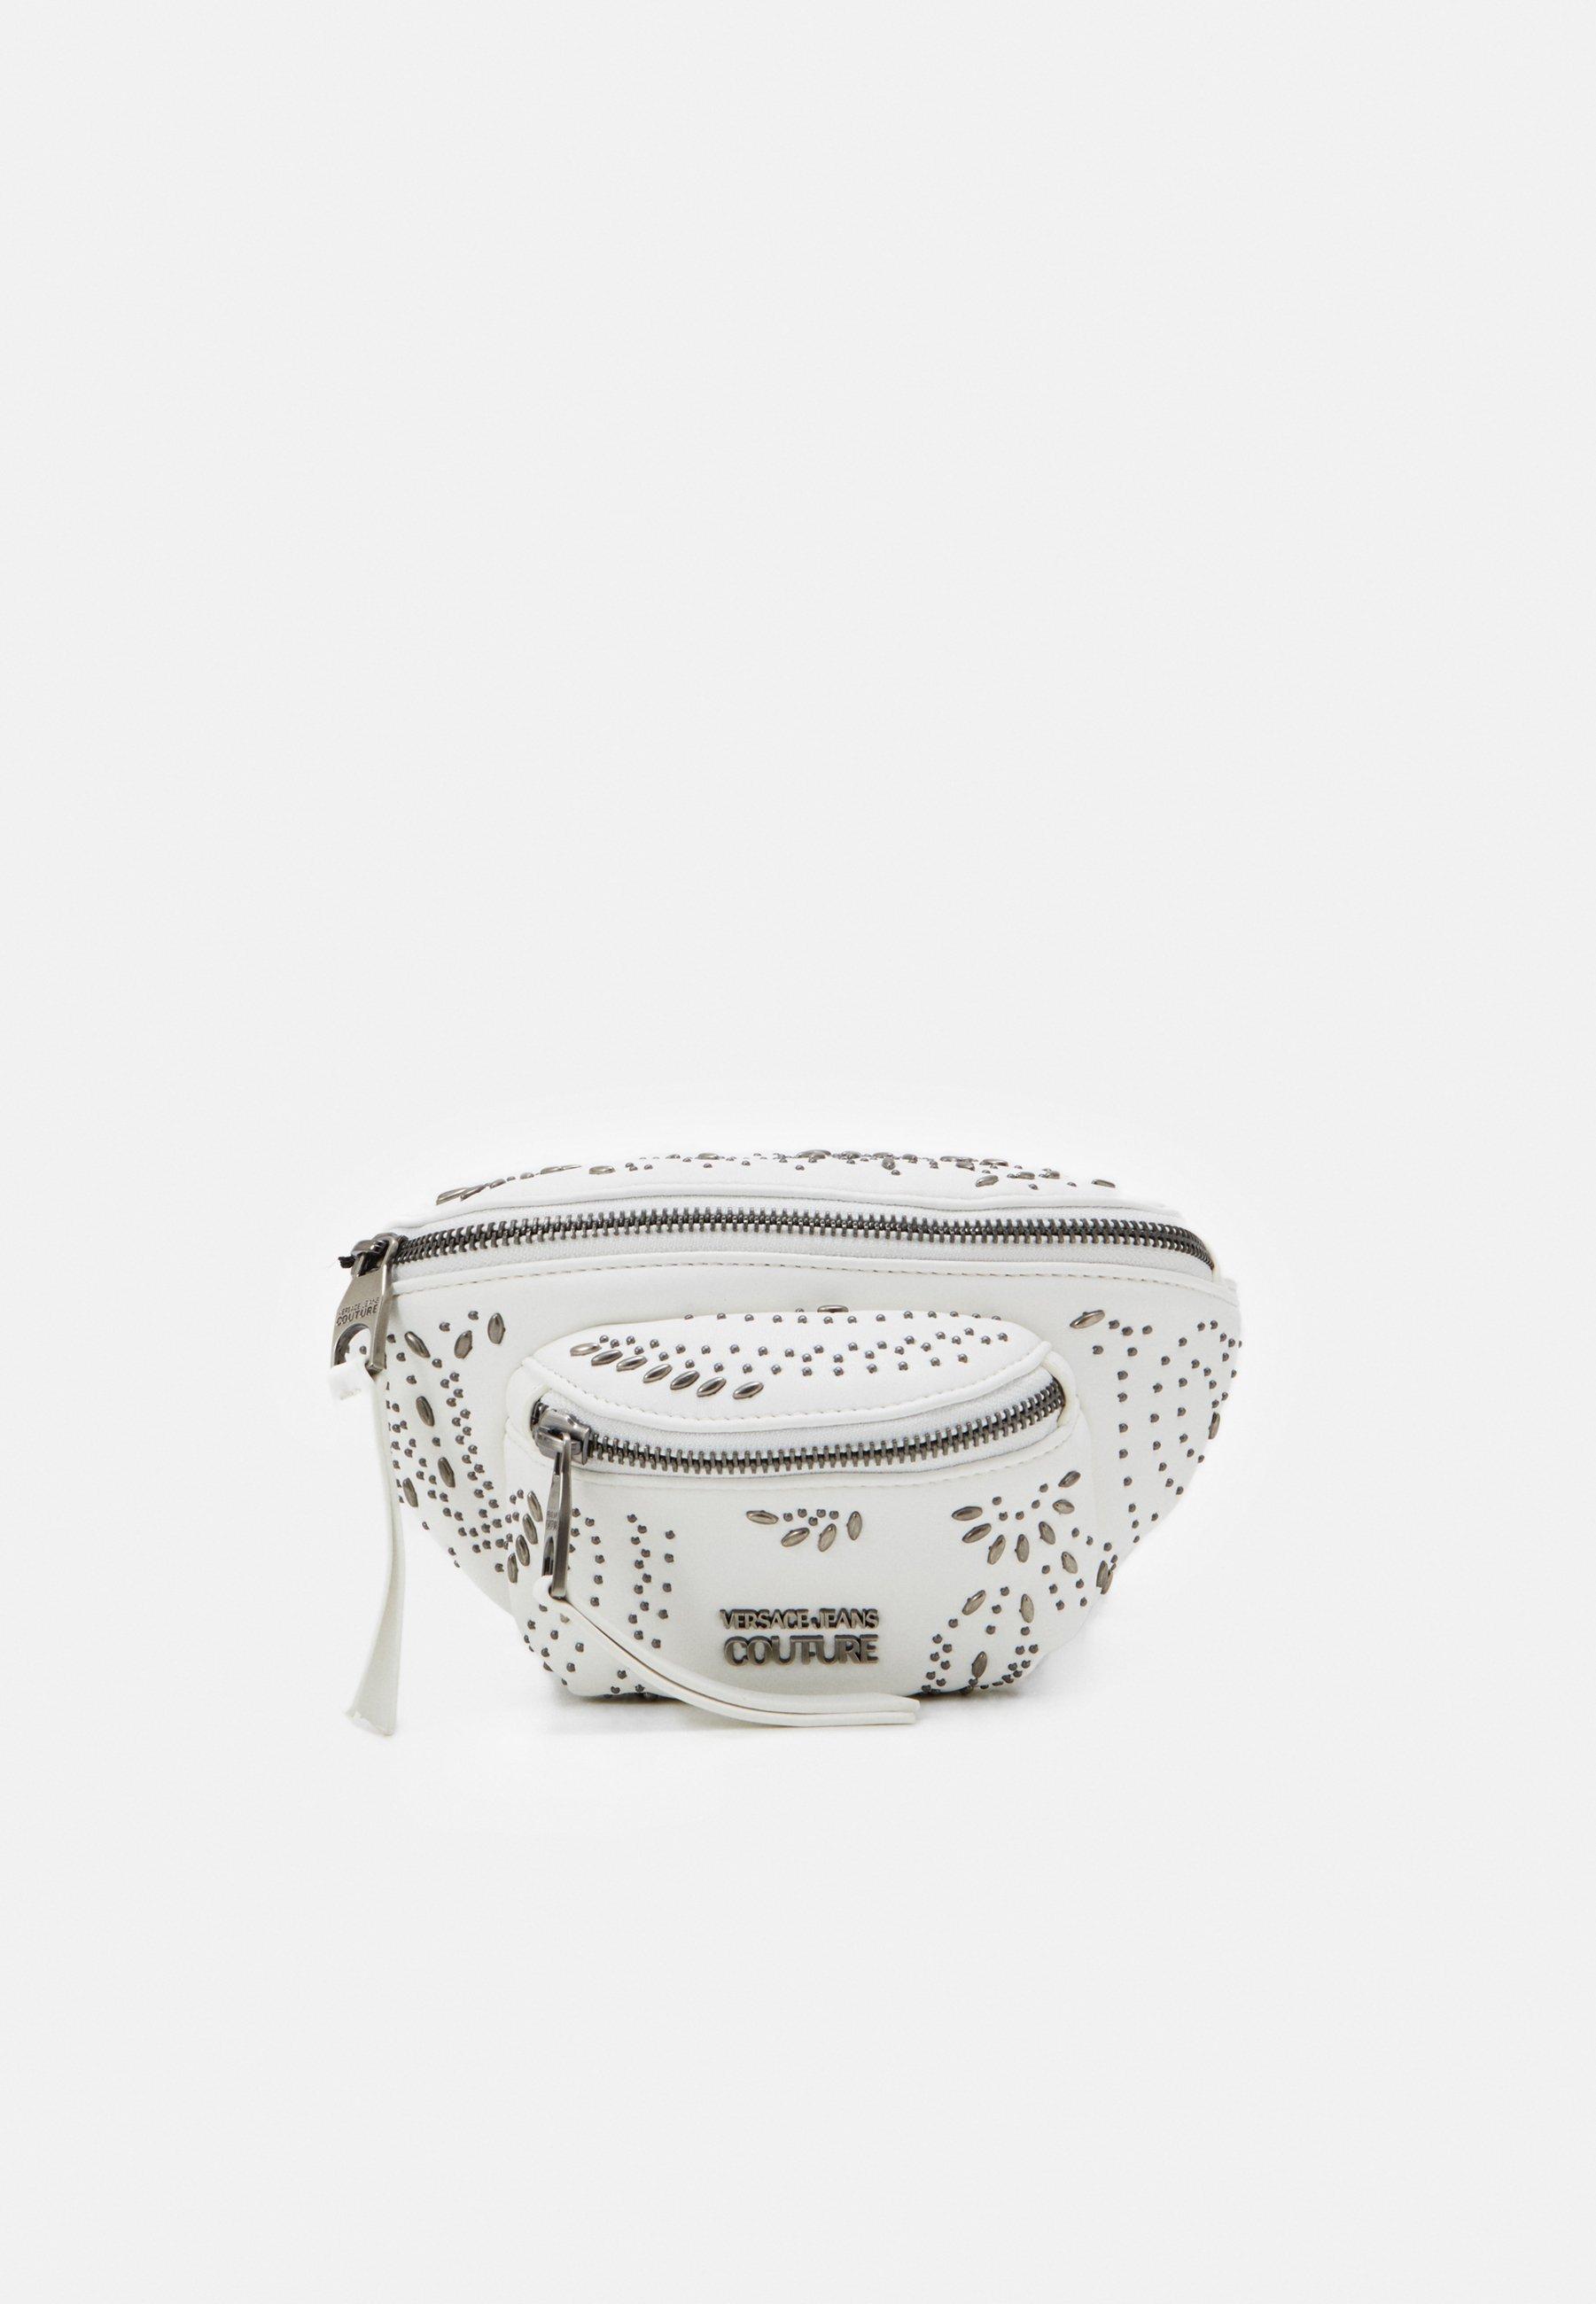 Versace Jeans Couture Belt Bag Mini Pocketspaisley Studs - Gürteltasche Nero/schwarz